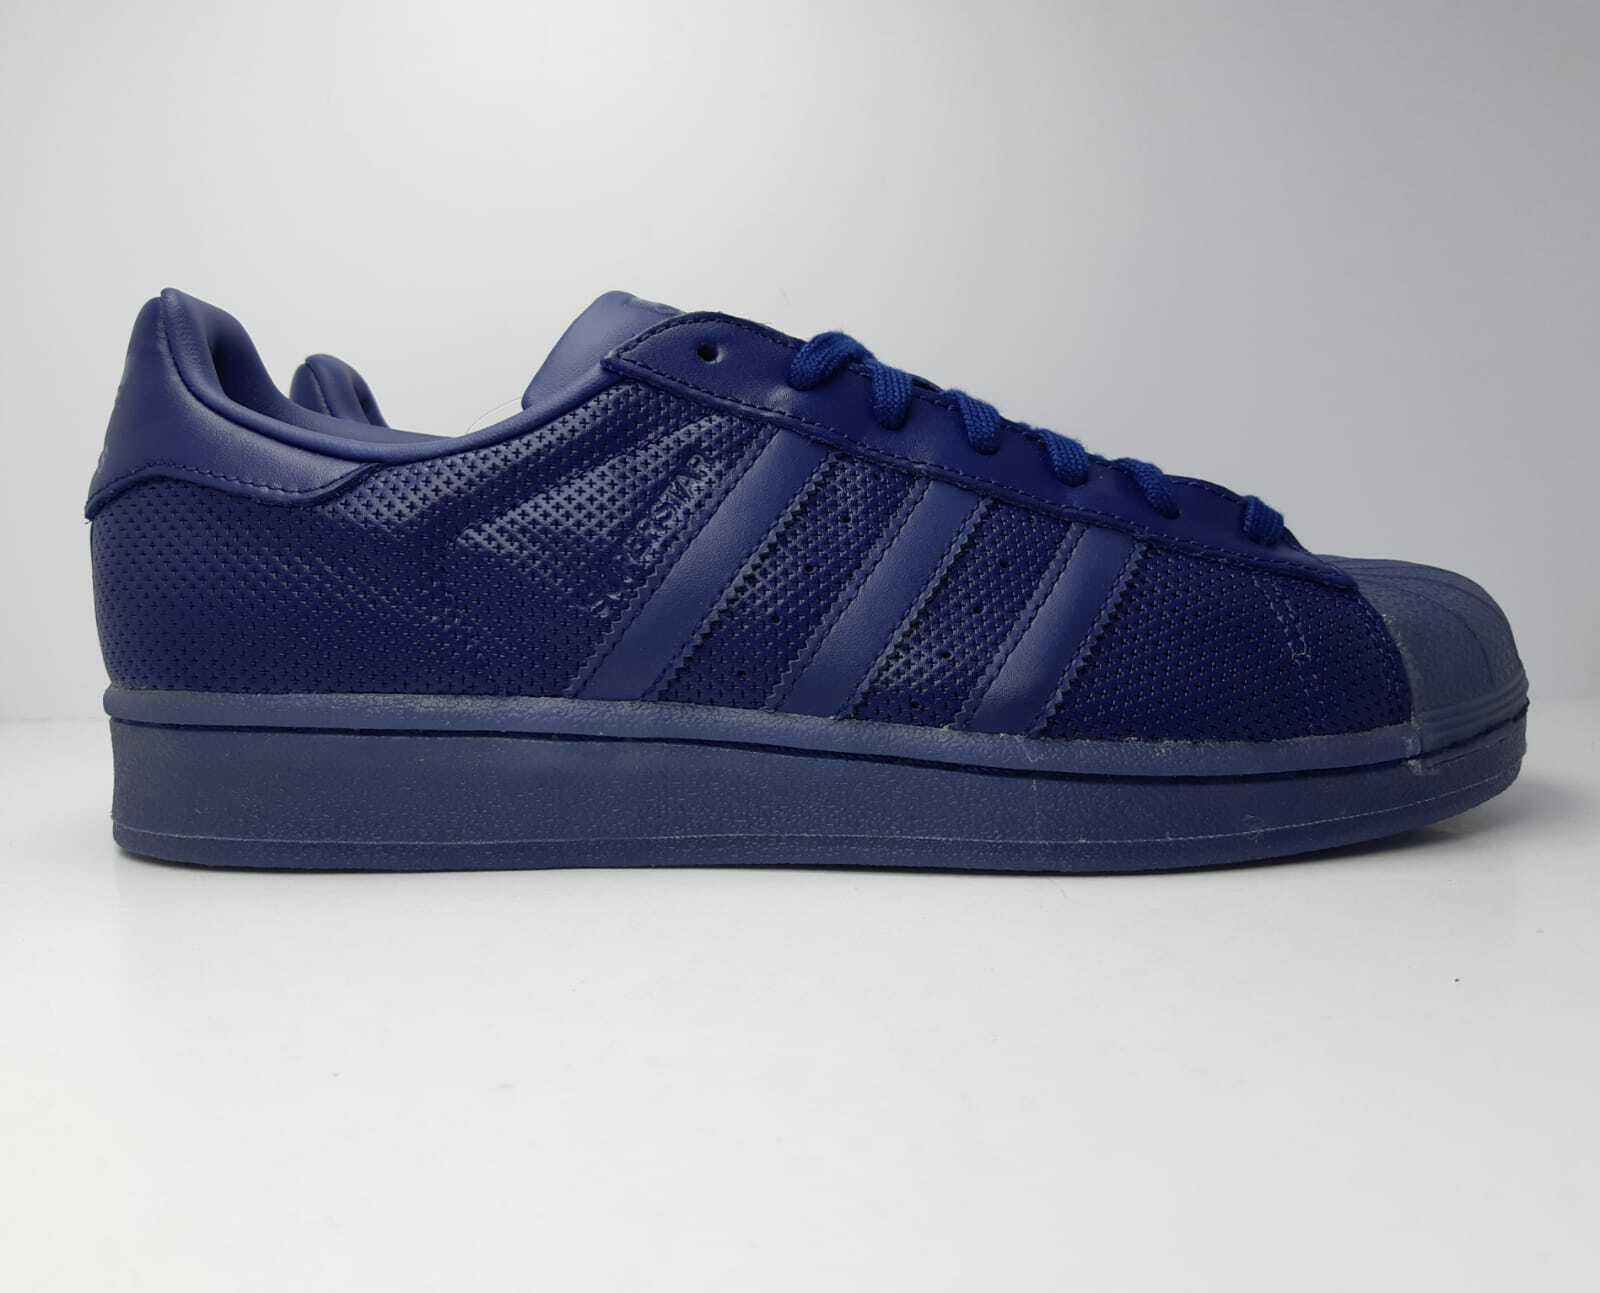 chaussures N. 42 2 3 UK 8 1 2 ADIDAS ORIGINALS SUPERSTAR ART. BB4267